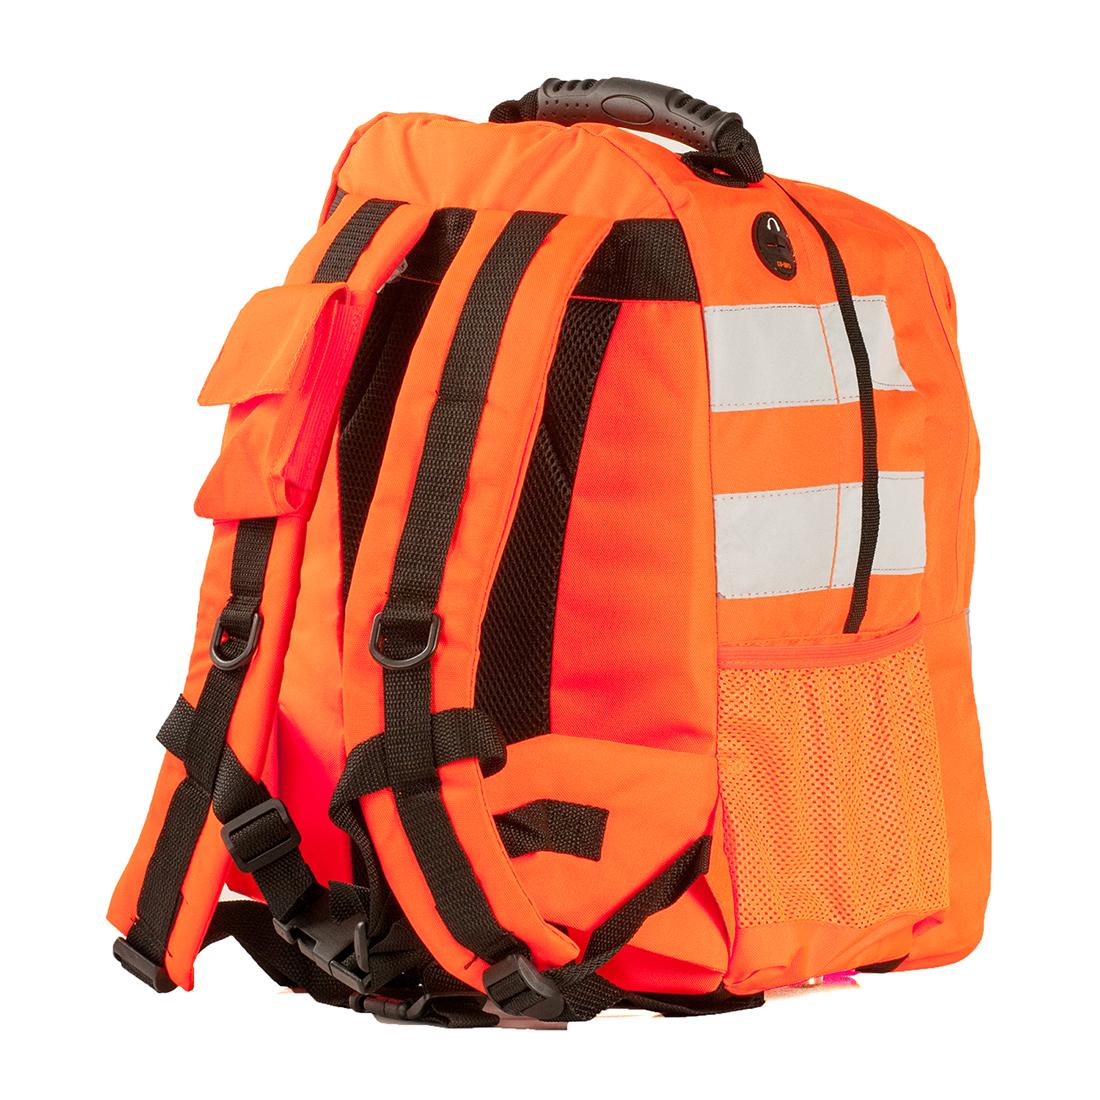 190116f7 Portwest B905 Hi Vis Rucksack - All Clothing & Protection | Uniforms ...